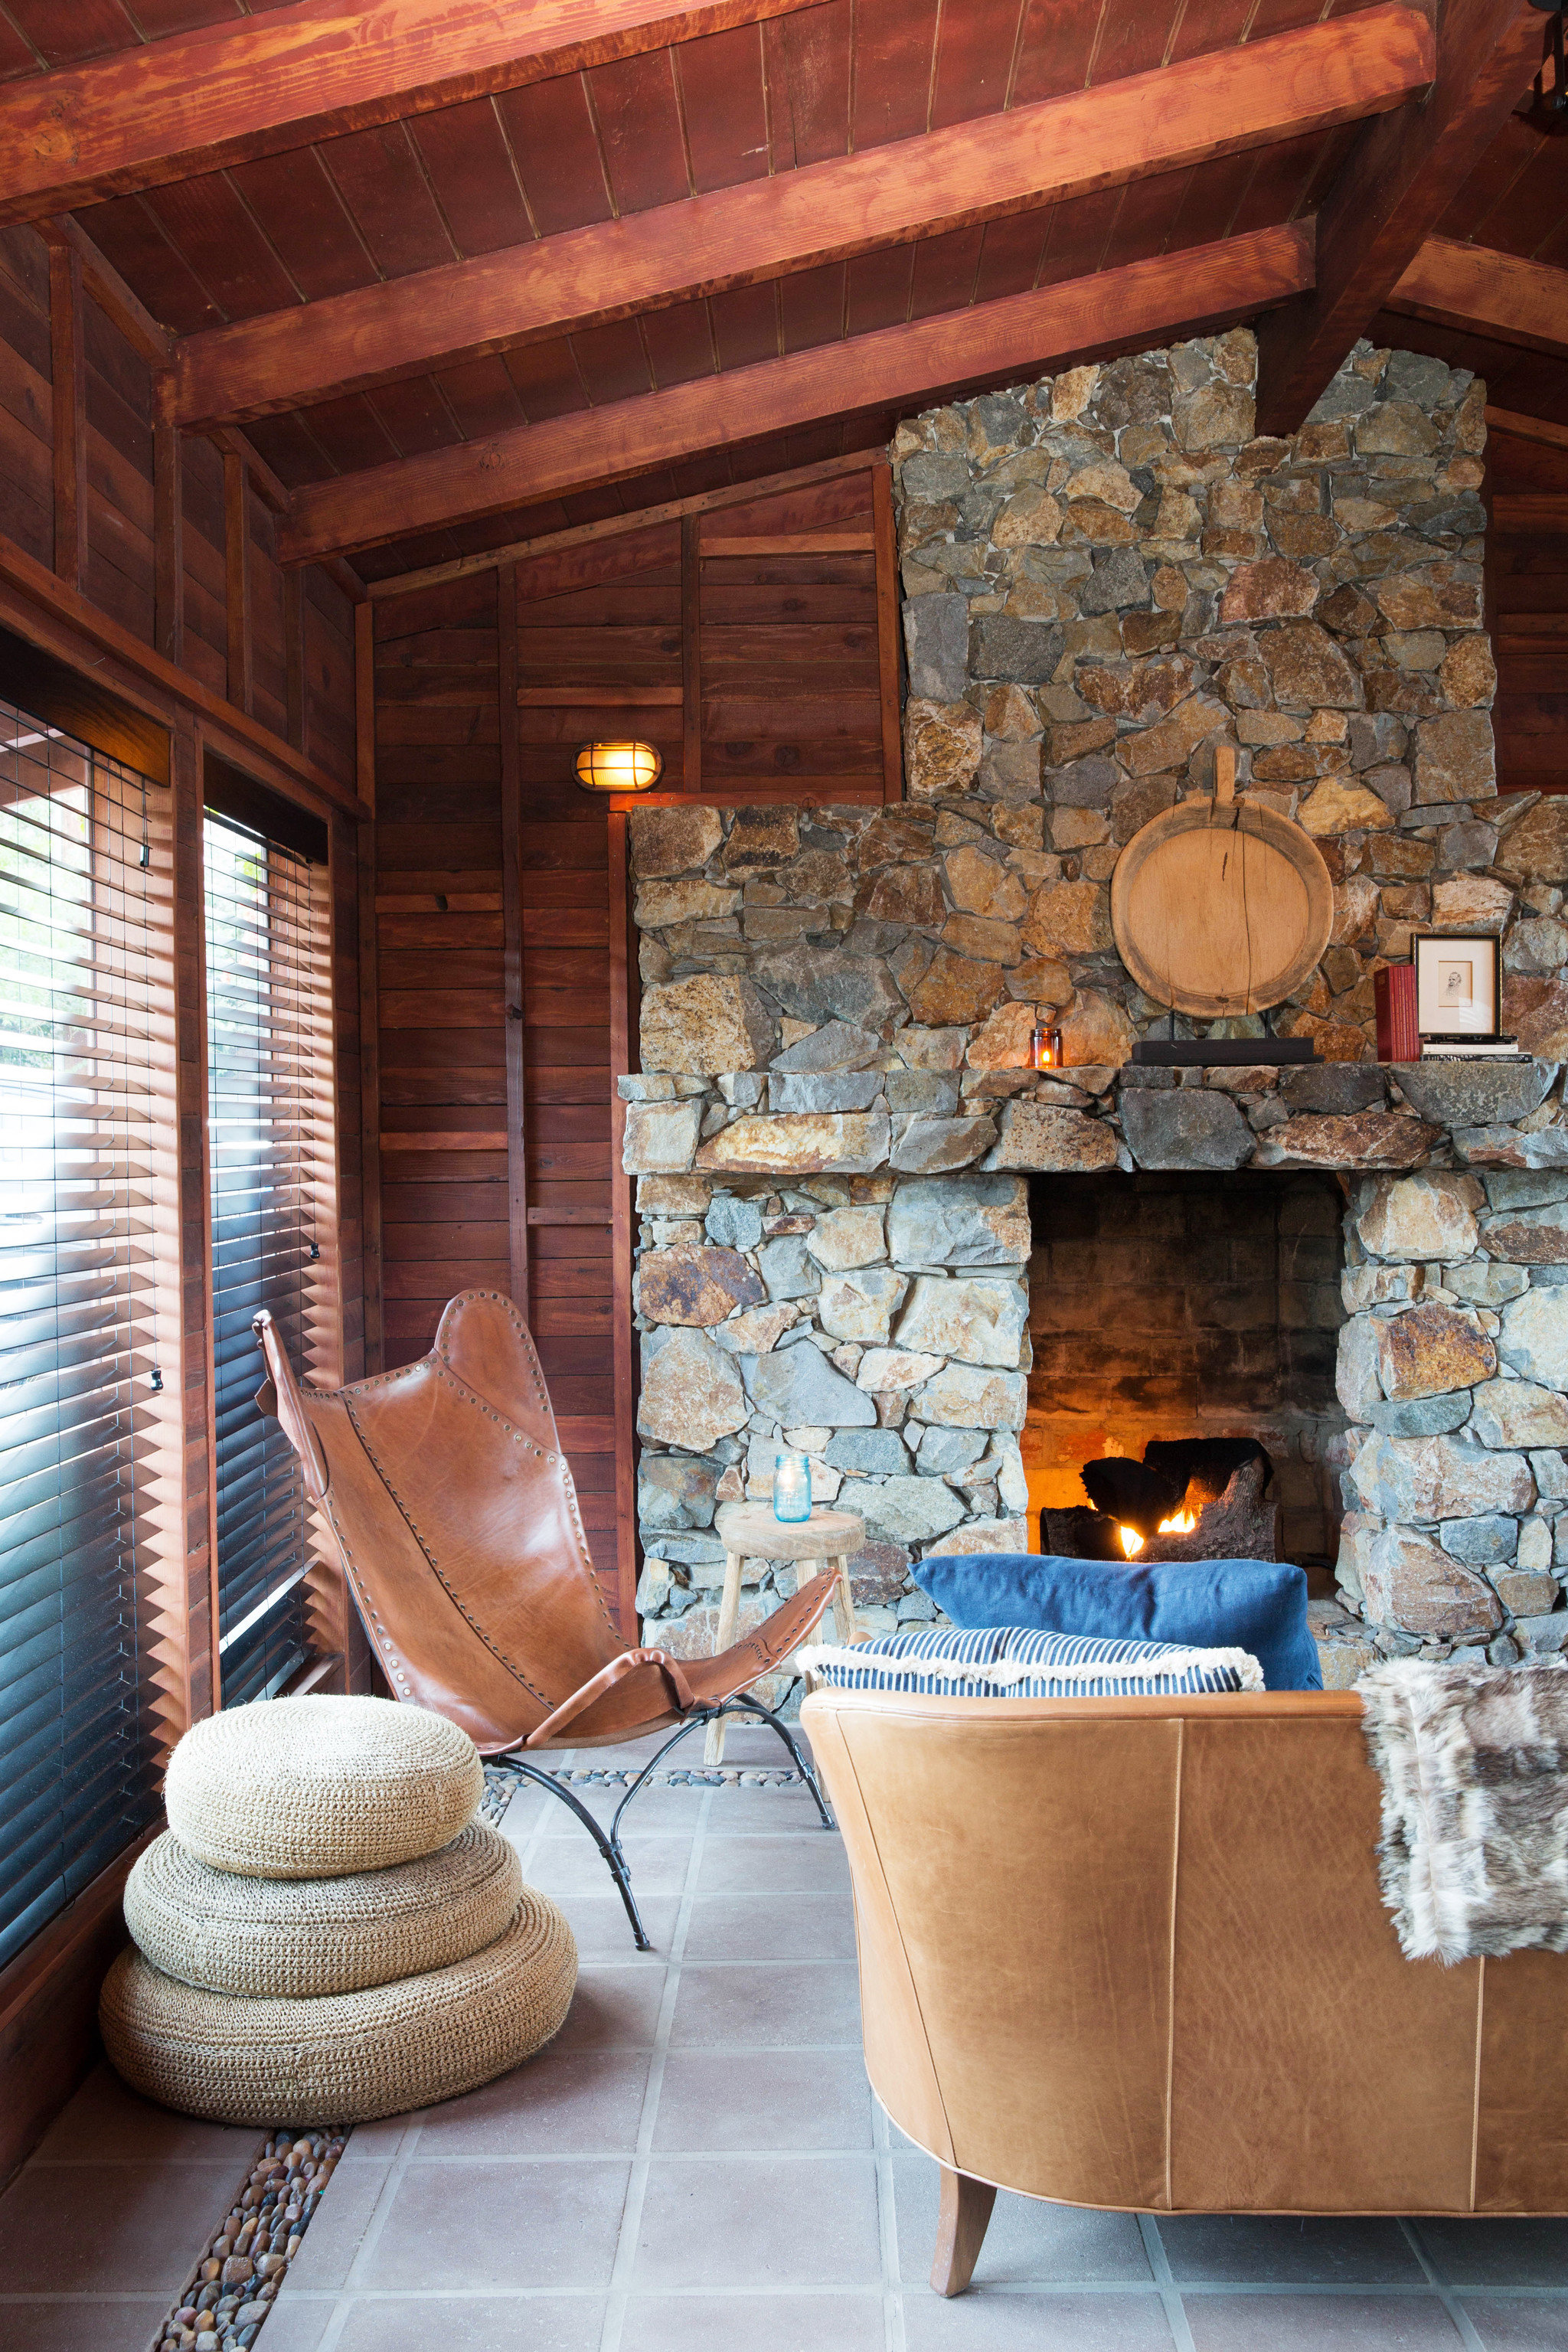 Jetsetter Guides indoor floor Fireplace Living room living room wall home wood hardwood cottage interior design log cabin hearth estate farmhouse furniture stone